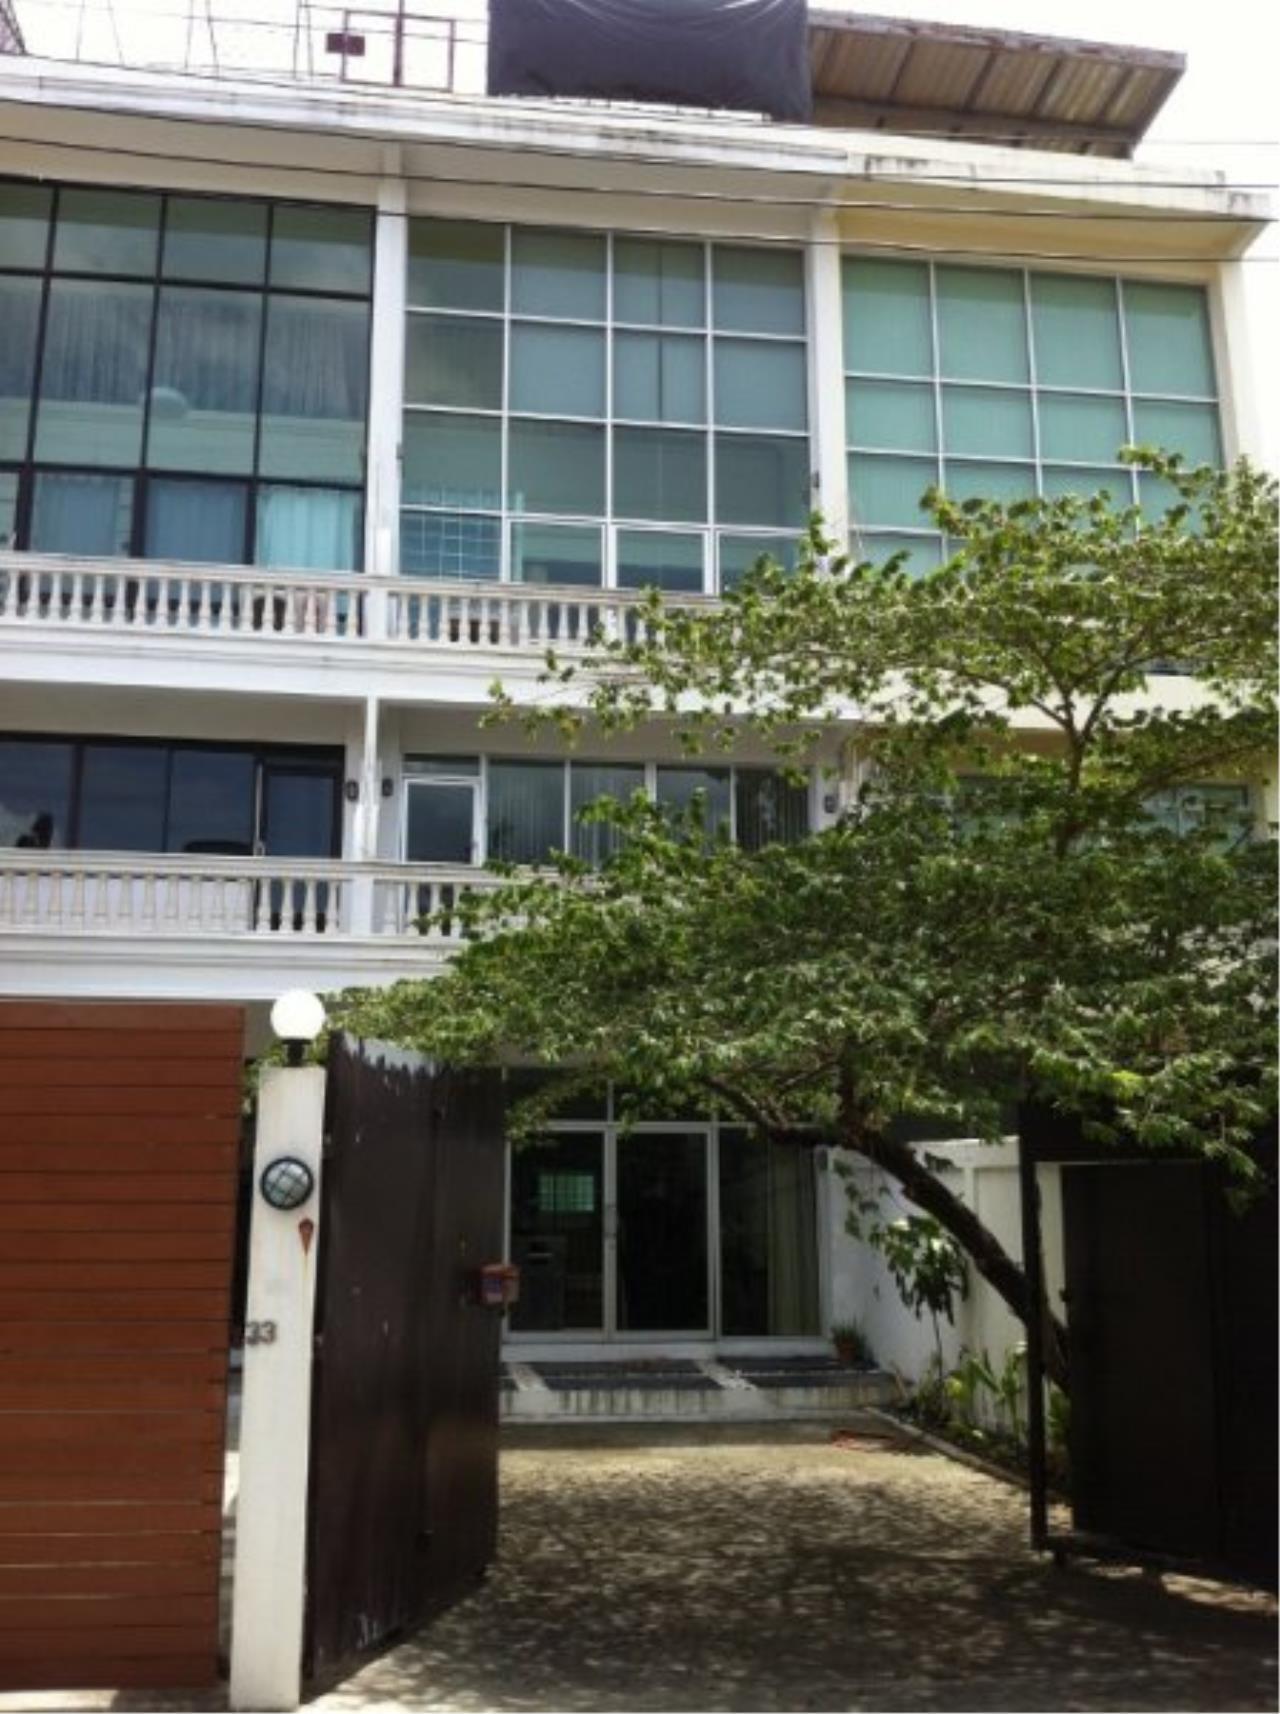 Piri Property Agency's Spacious 5 Bedrooms Townhouse in Sukumvit for sale 1